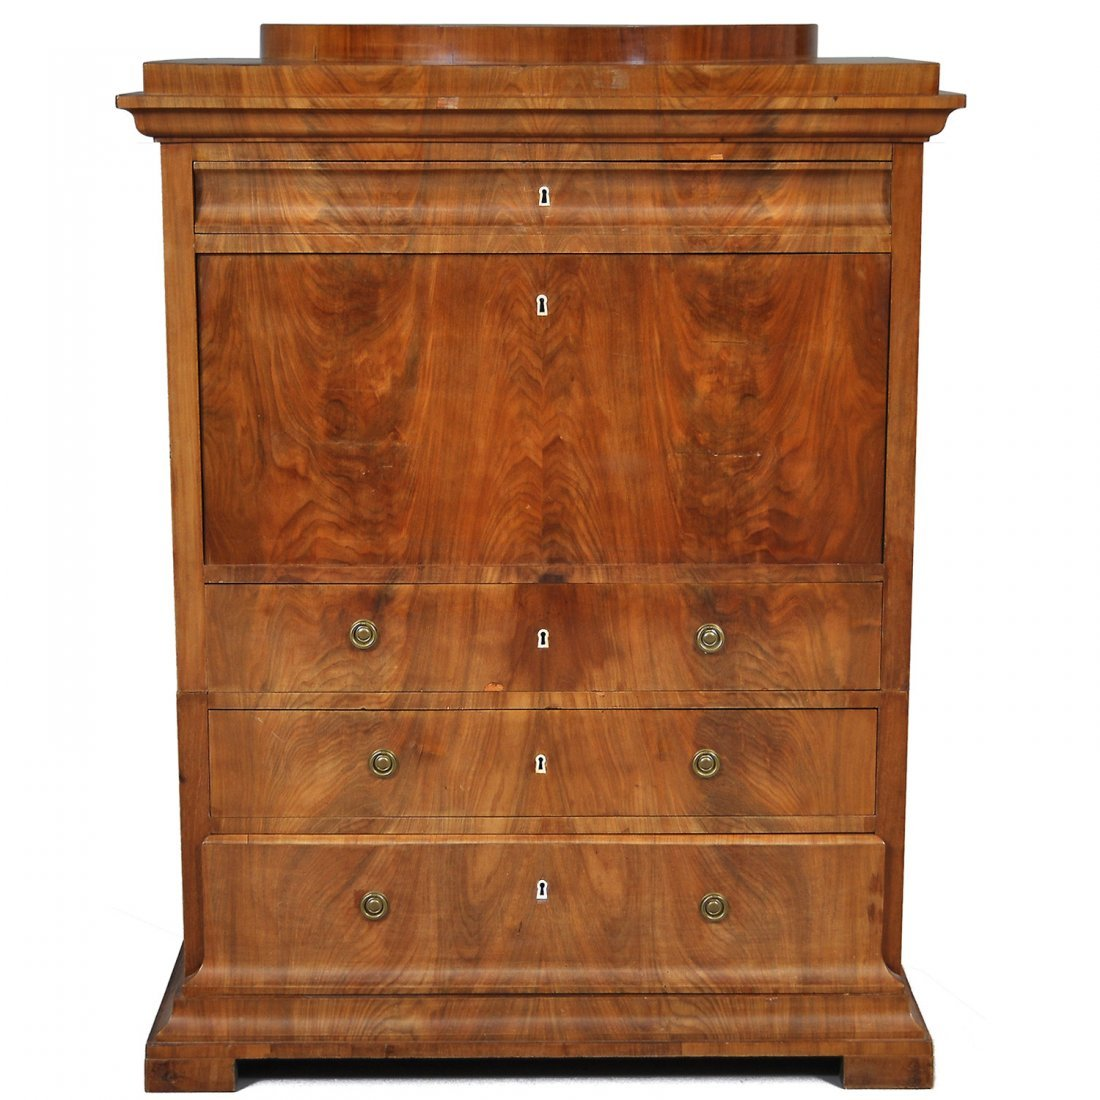 10: CHIFFONJE, mahogny, 1800-tal, empirestil